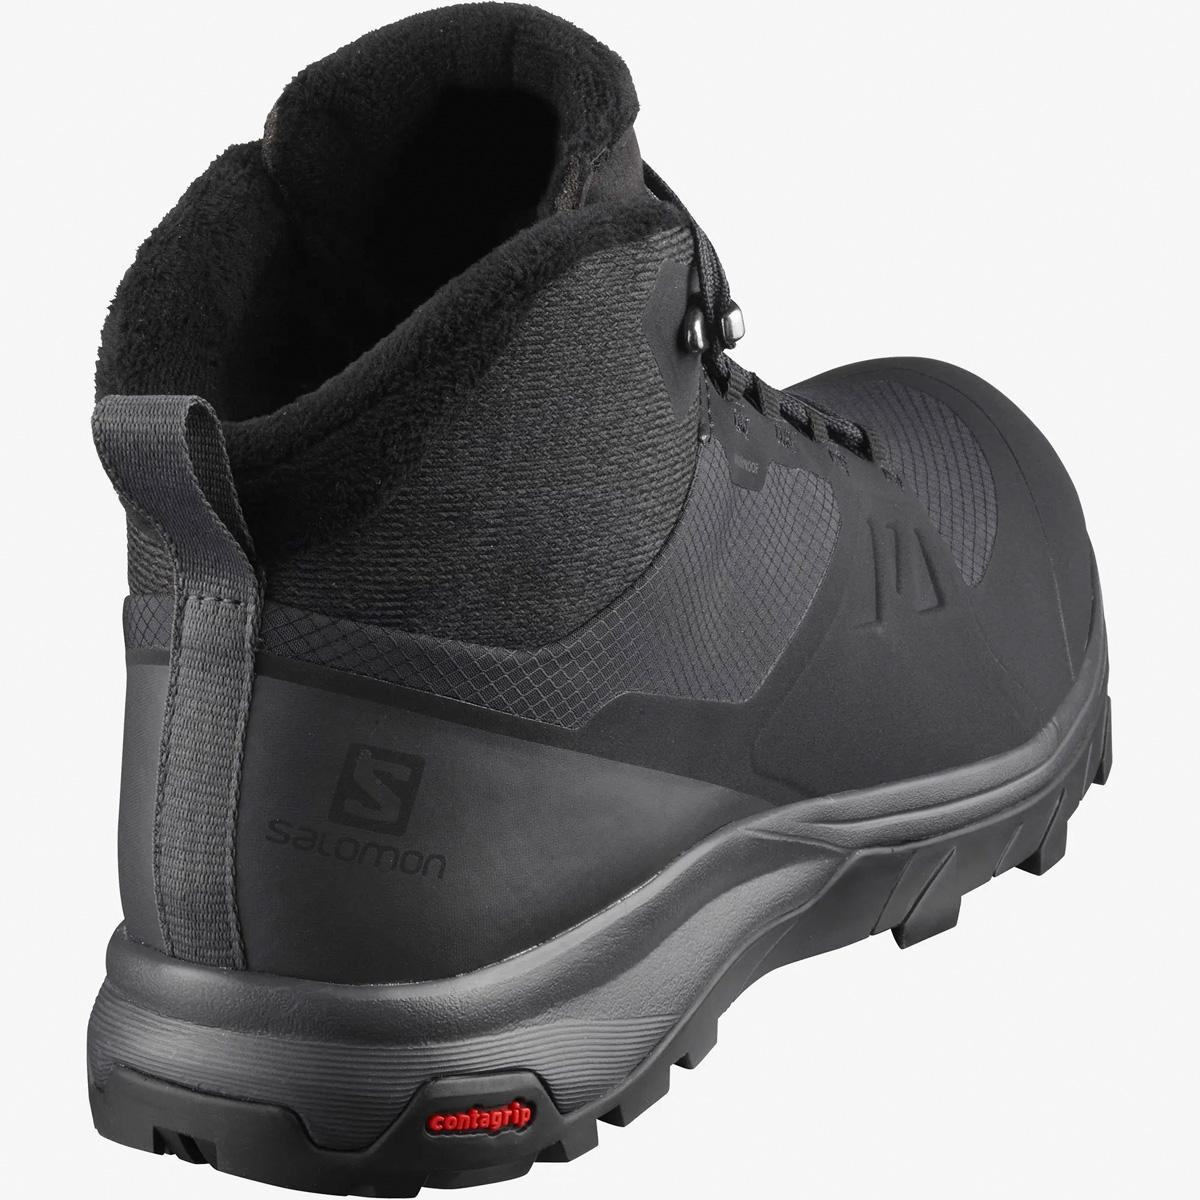 Ботинки утепленные OUTsnap CSWP W